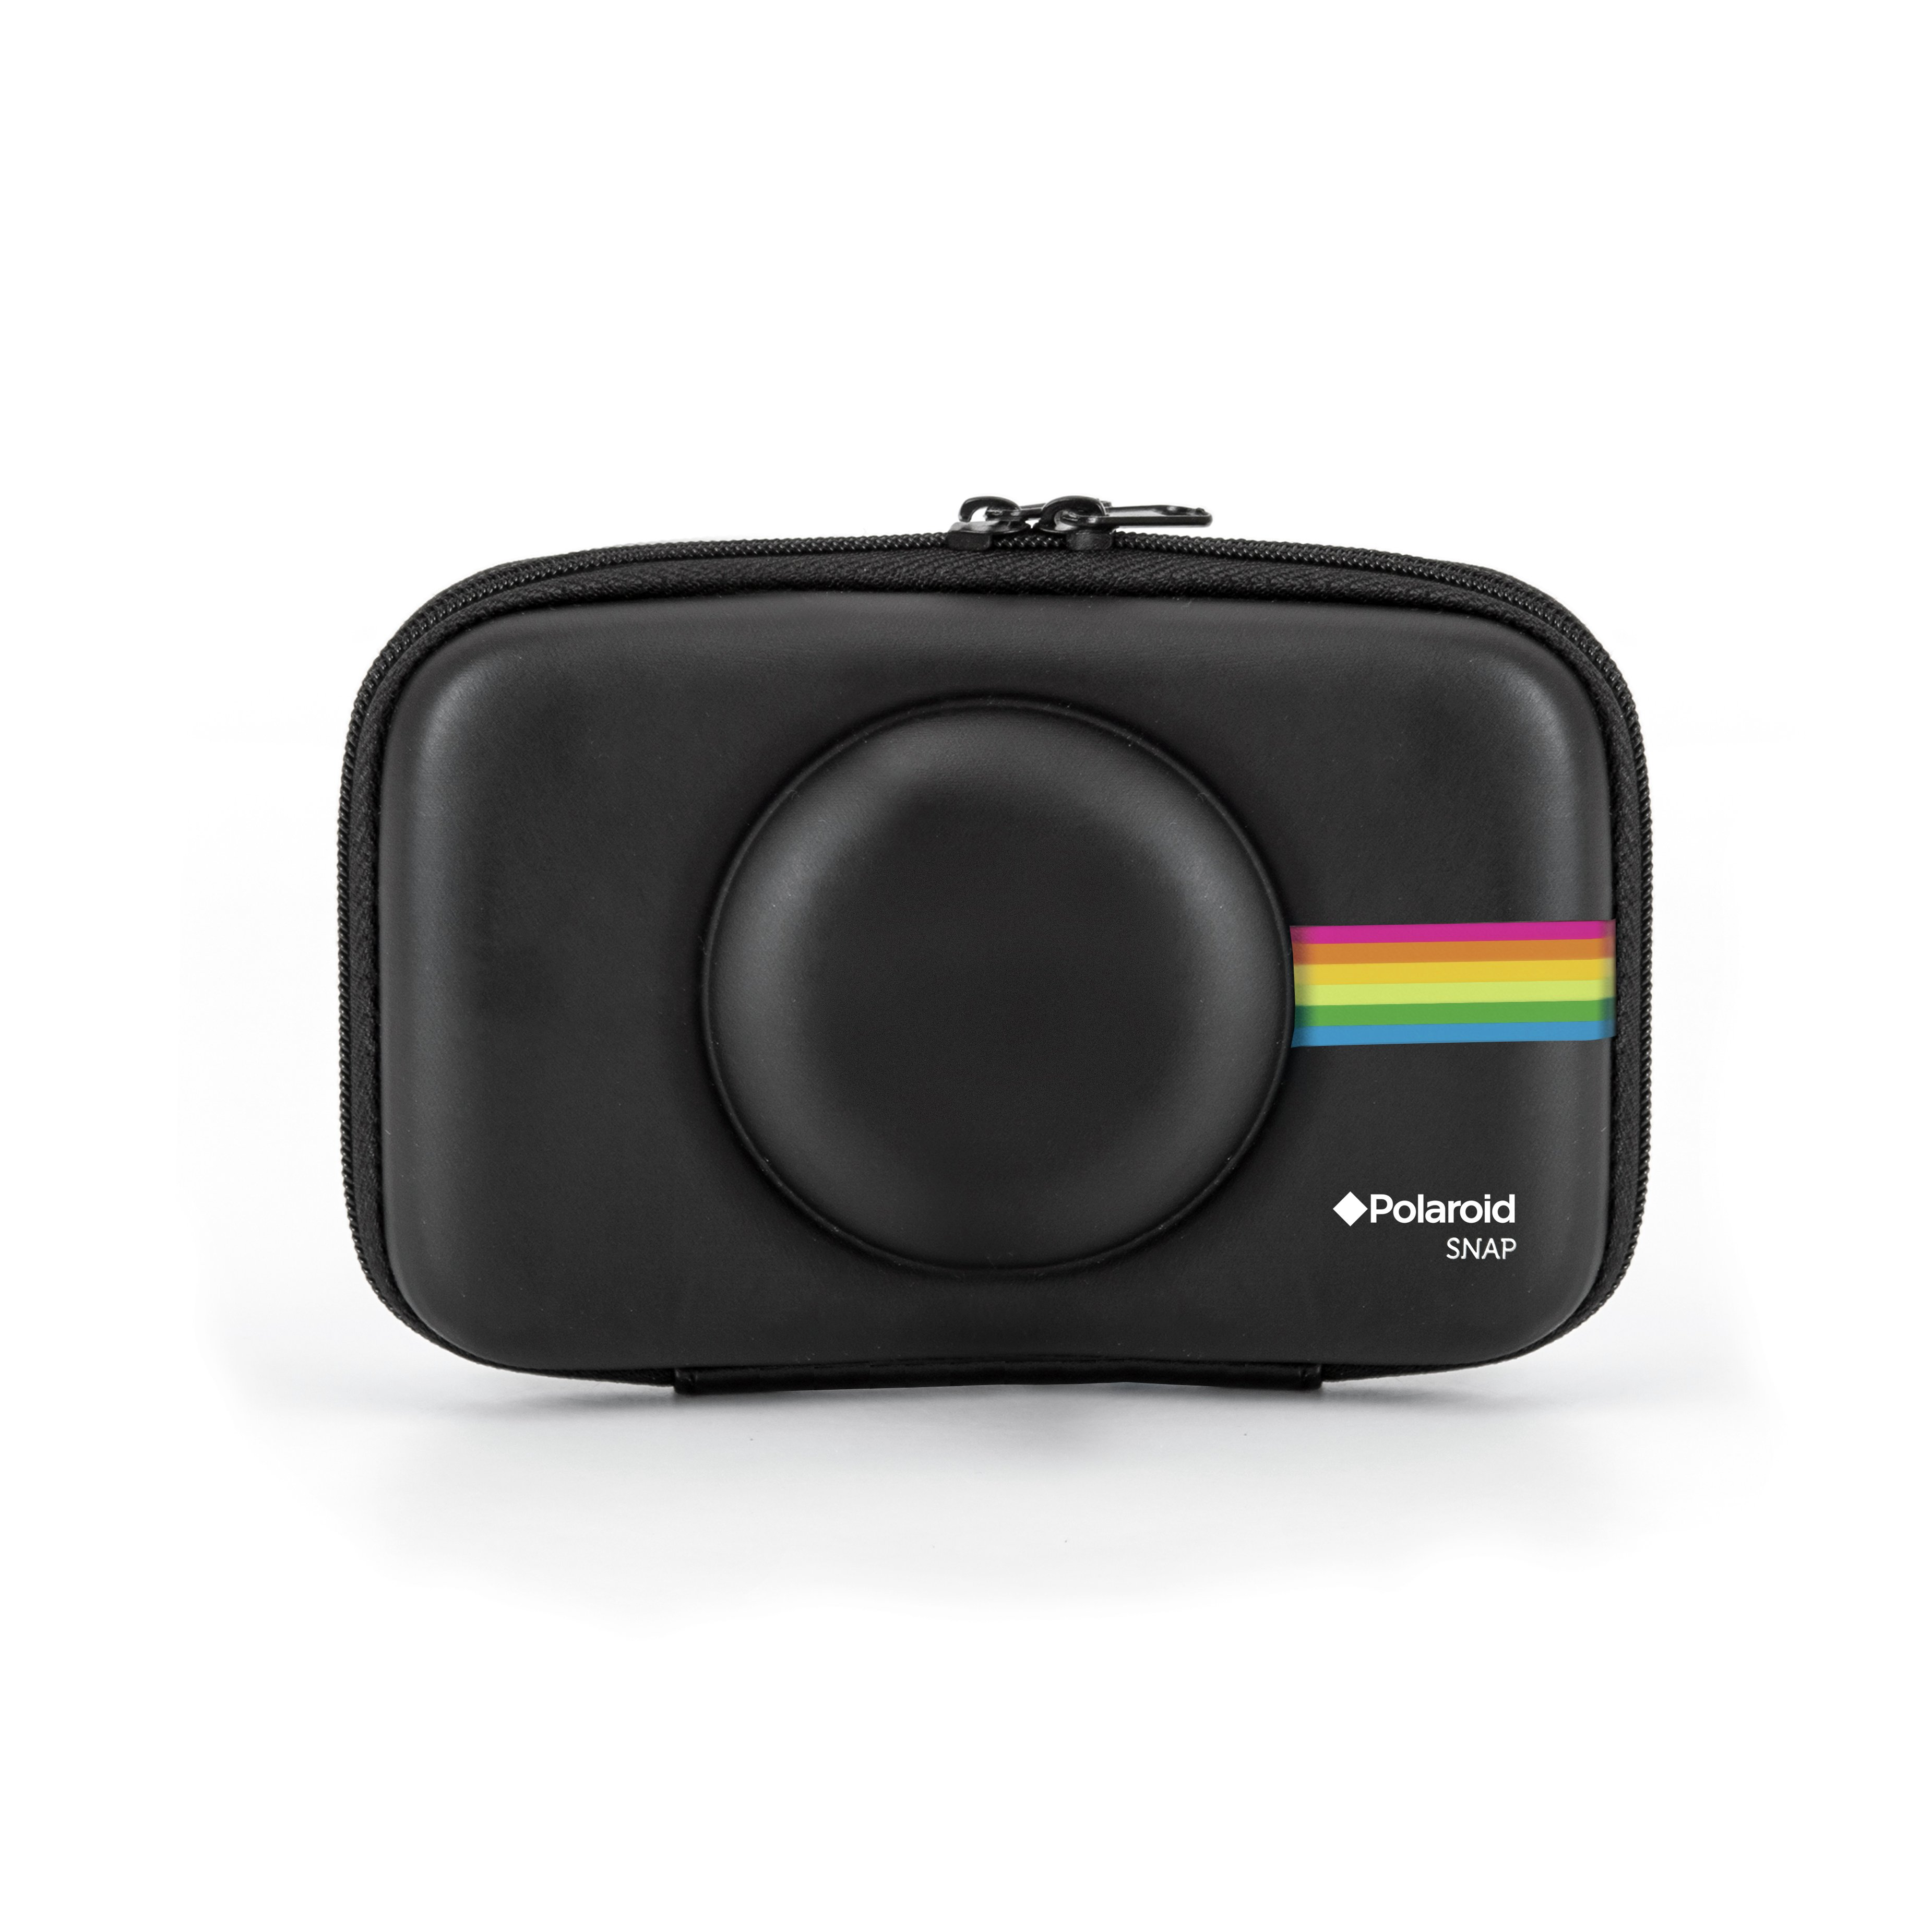 Polaroid - EVA Case for Snap - Black